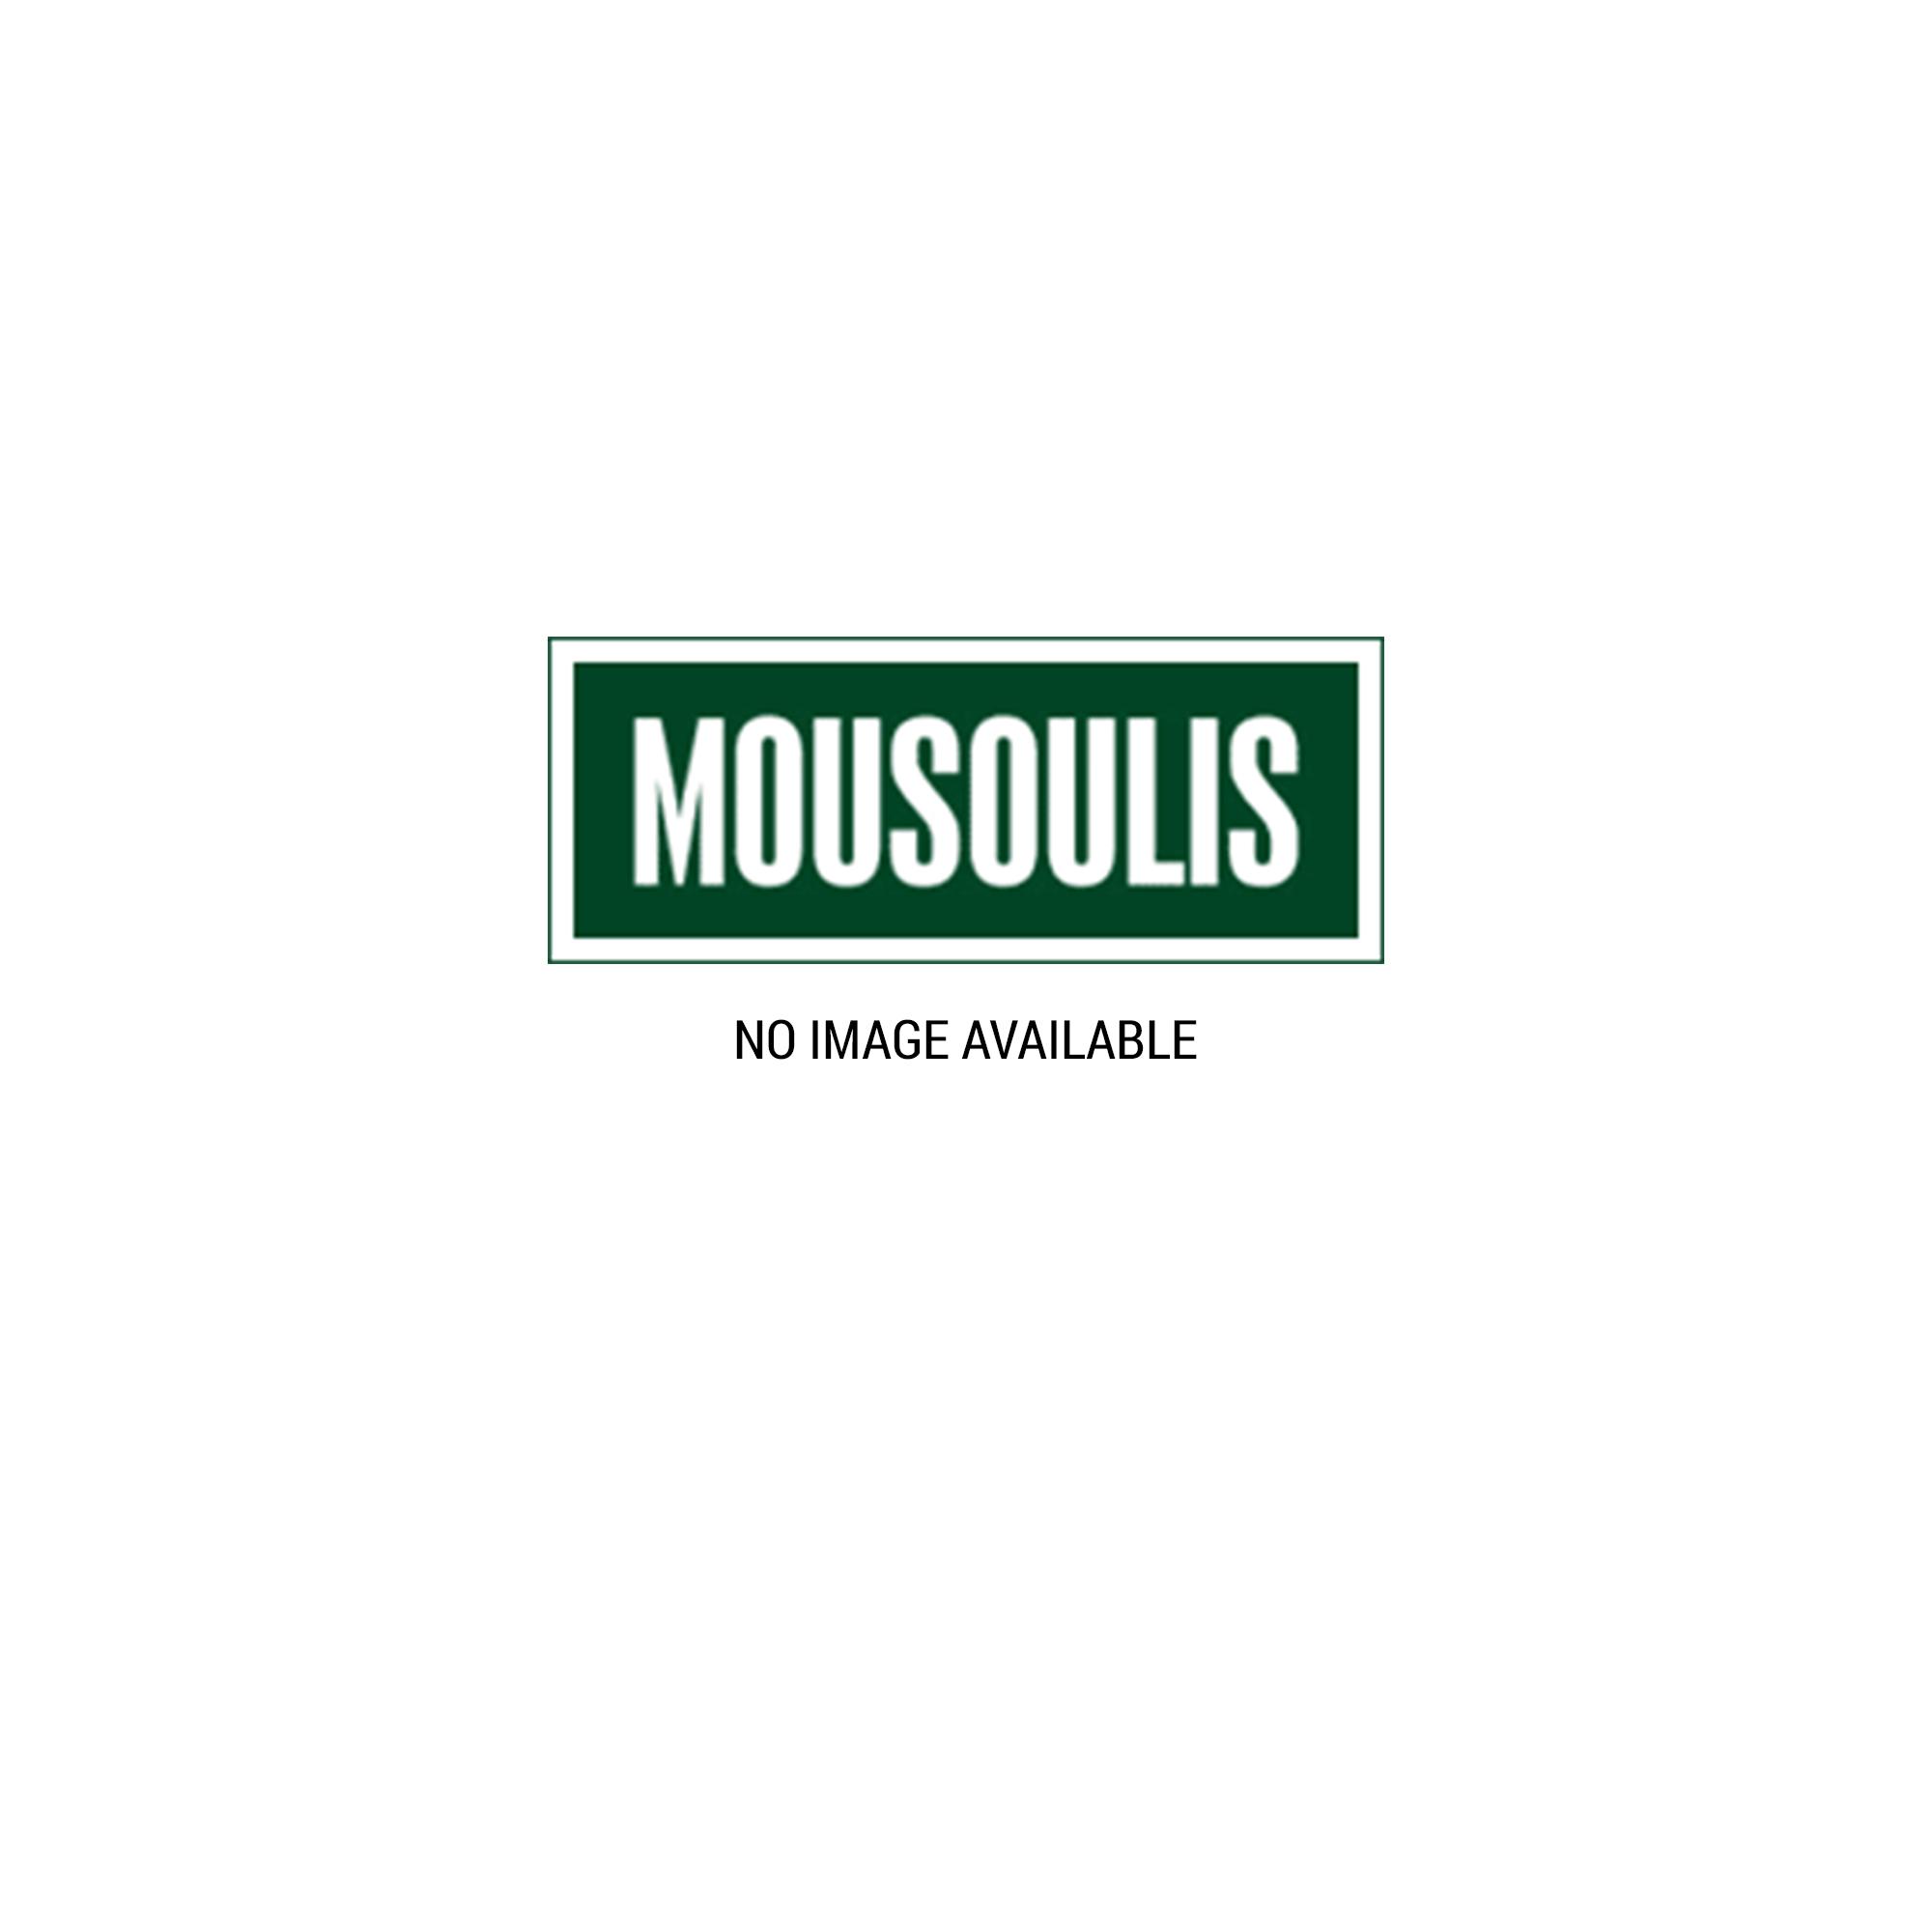 Hugo Boss Green Polo Μπλούζα Πικέ με Διχρωμίες Κανονική Γραμμή Plisy 50272945 Μωβ